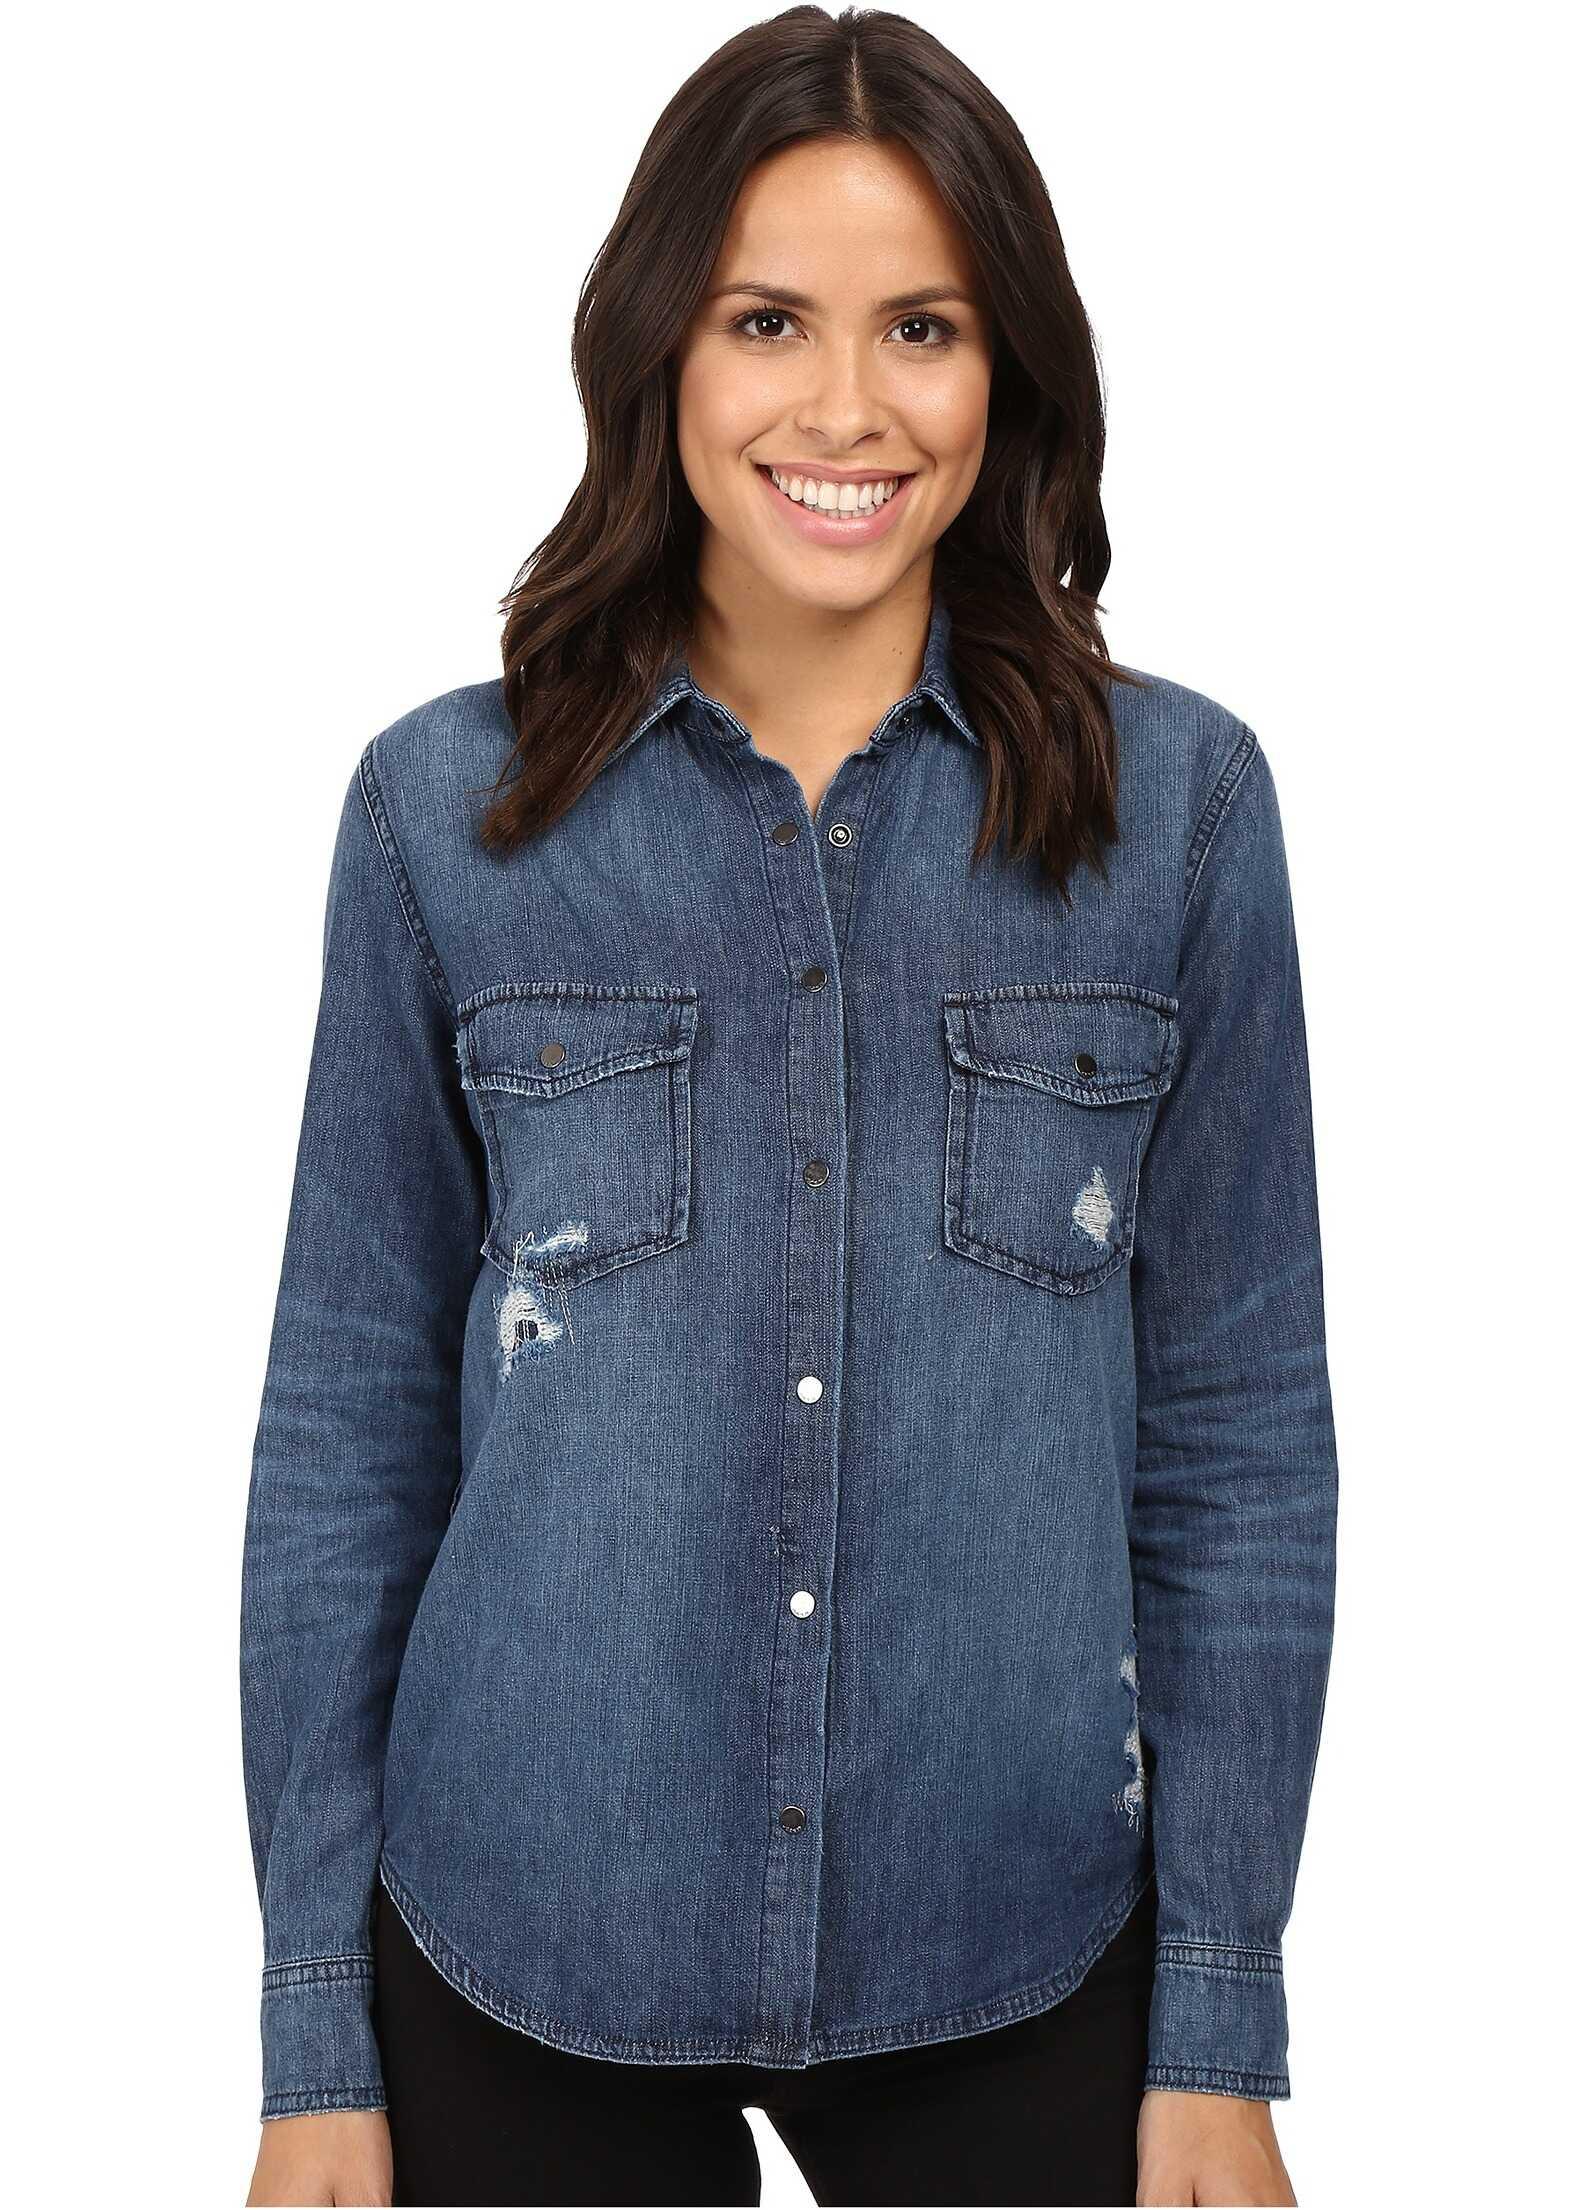 Joes Jeans Sloane Shirt Indigo